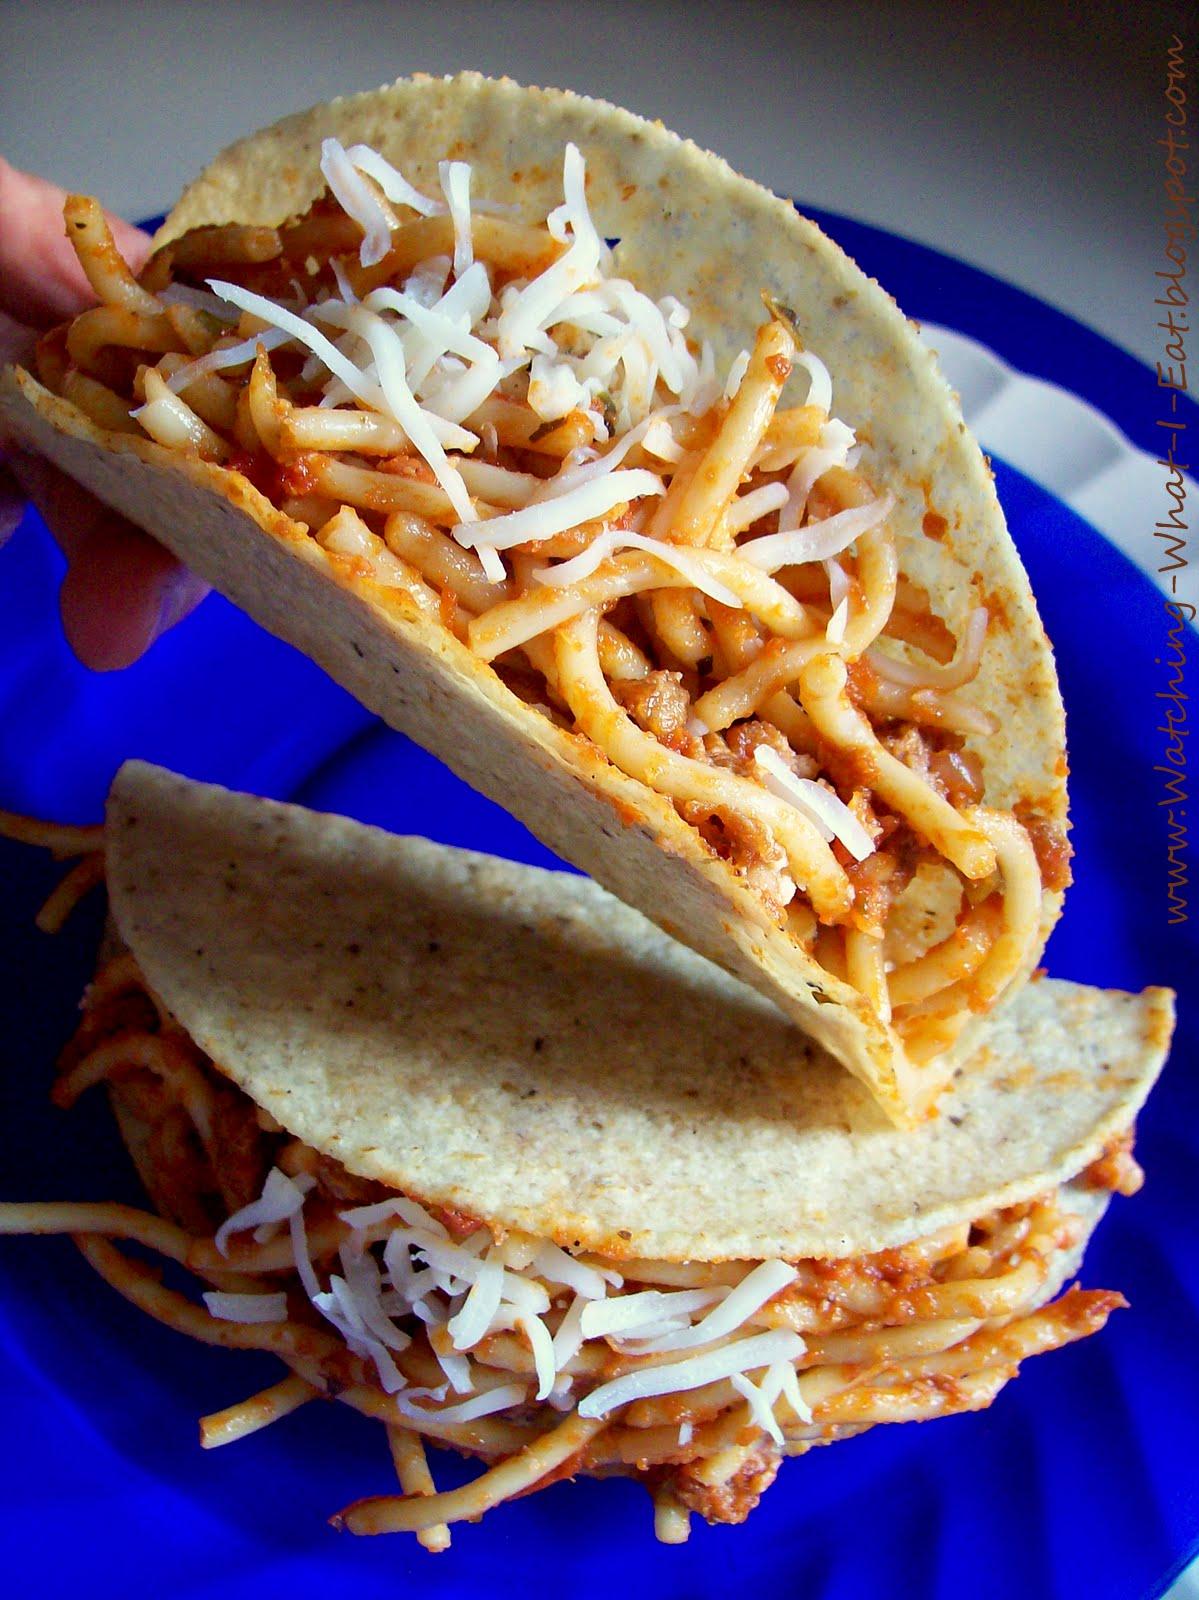 Watching What I Eat Spaghetti Tacos Spaghetti Nachos Ikidding Around In The Kitchen